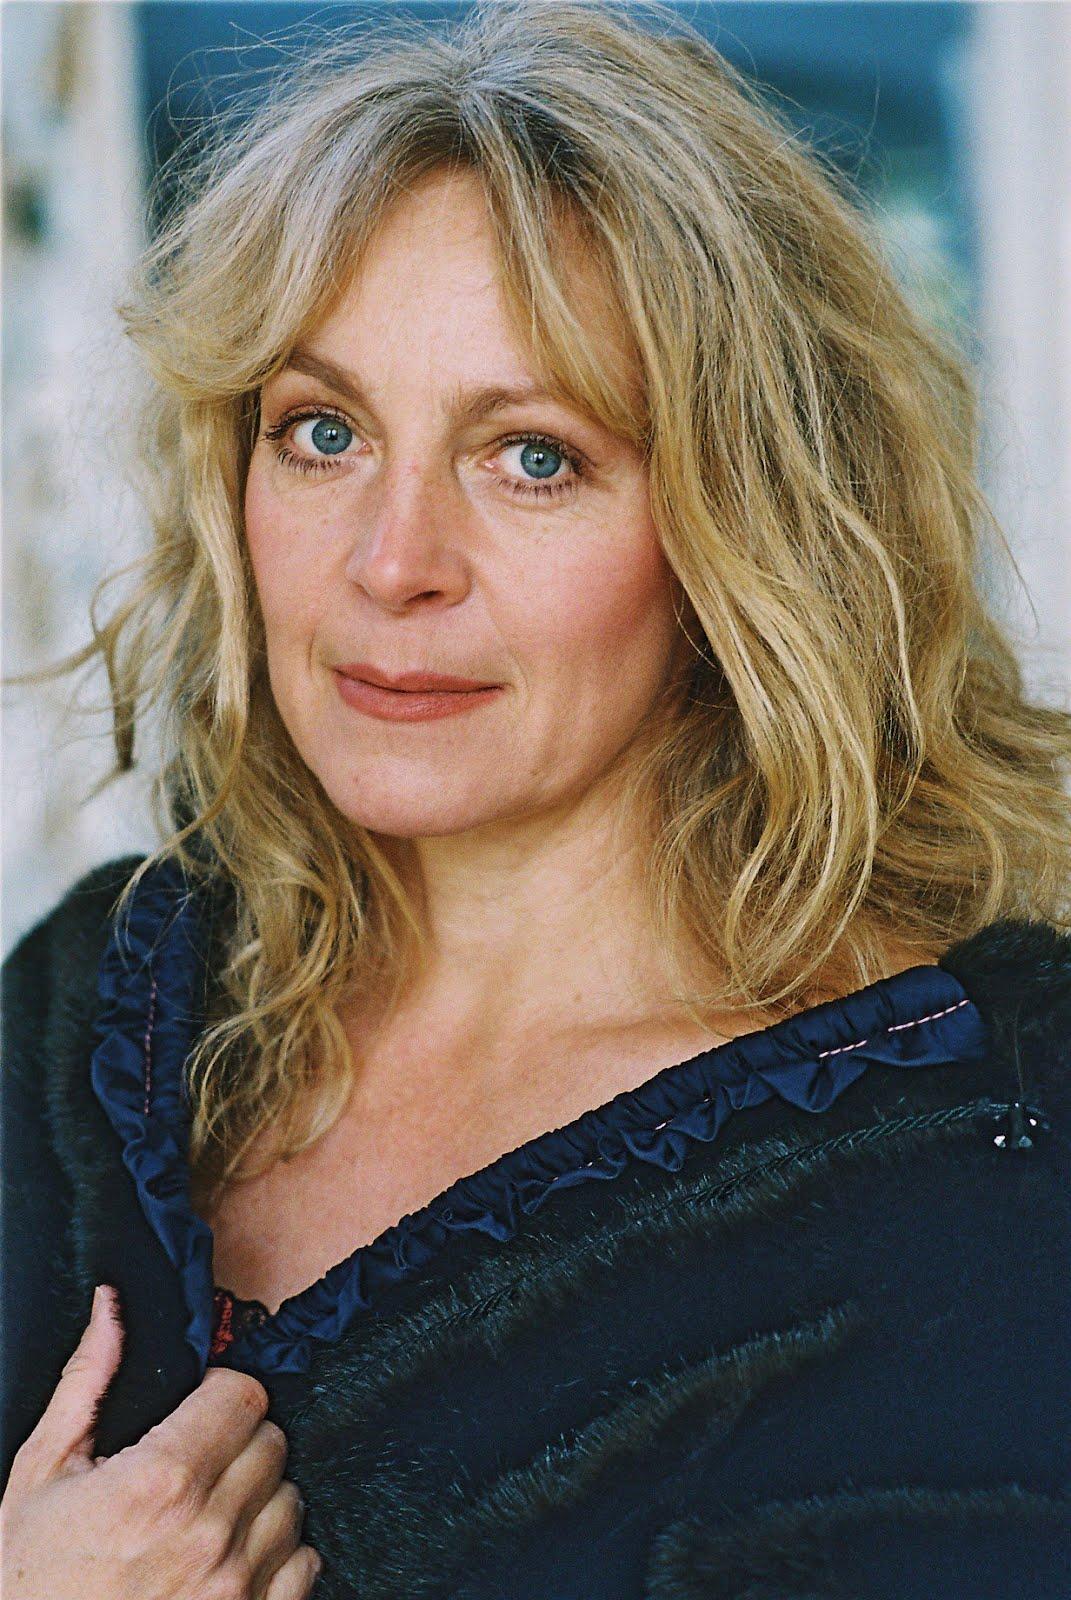 April Hailer